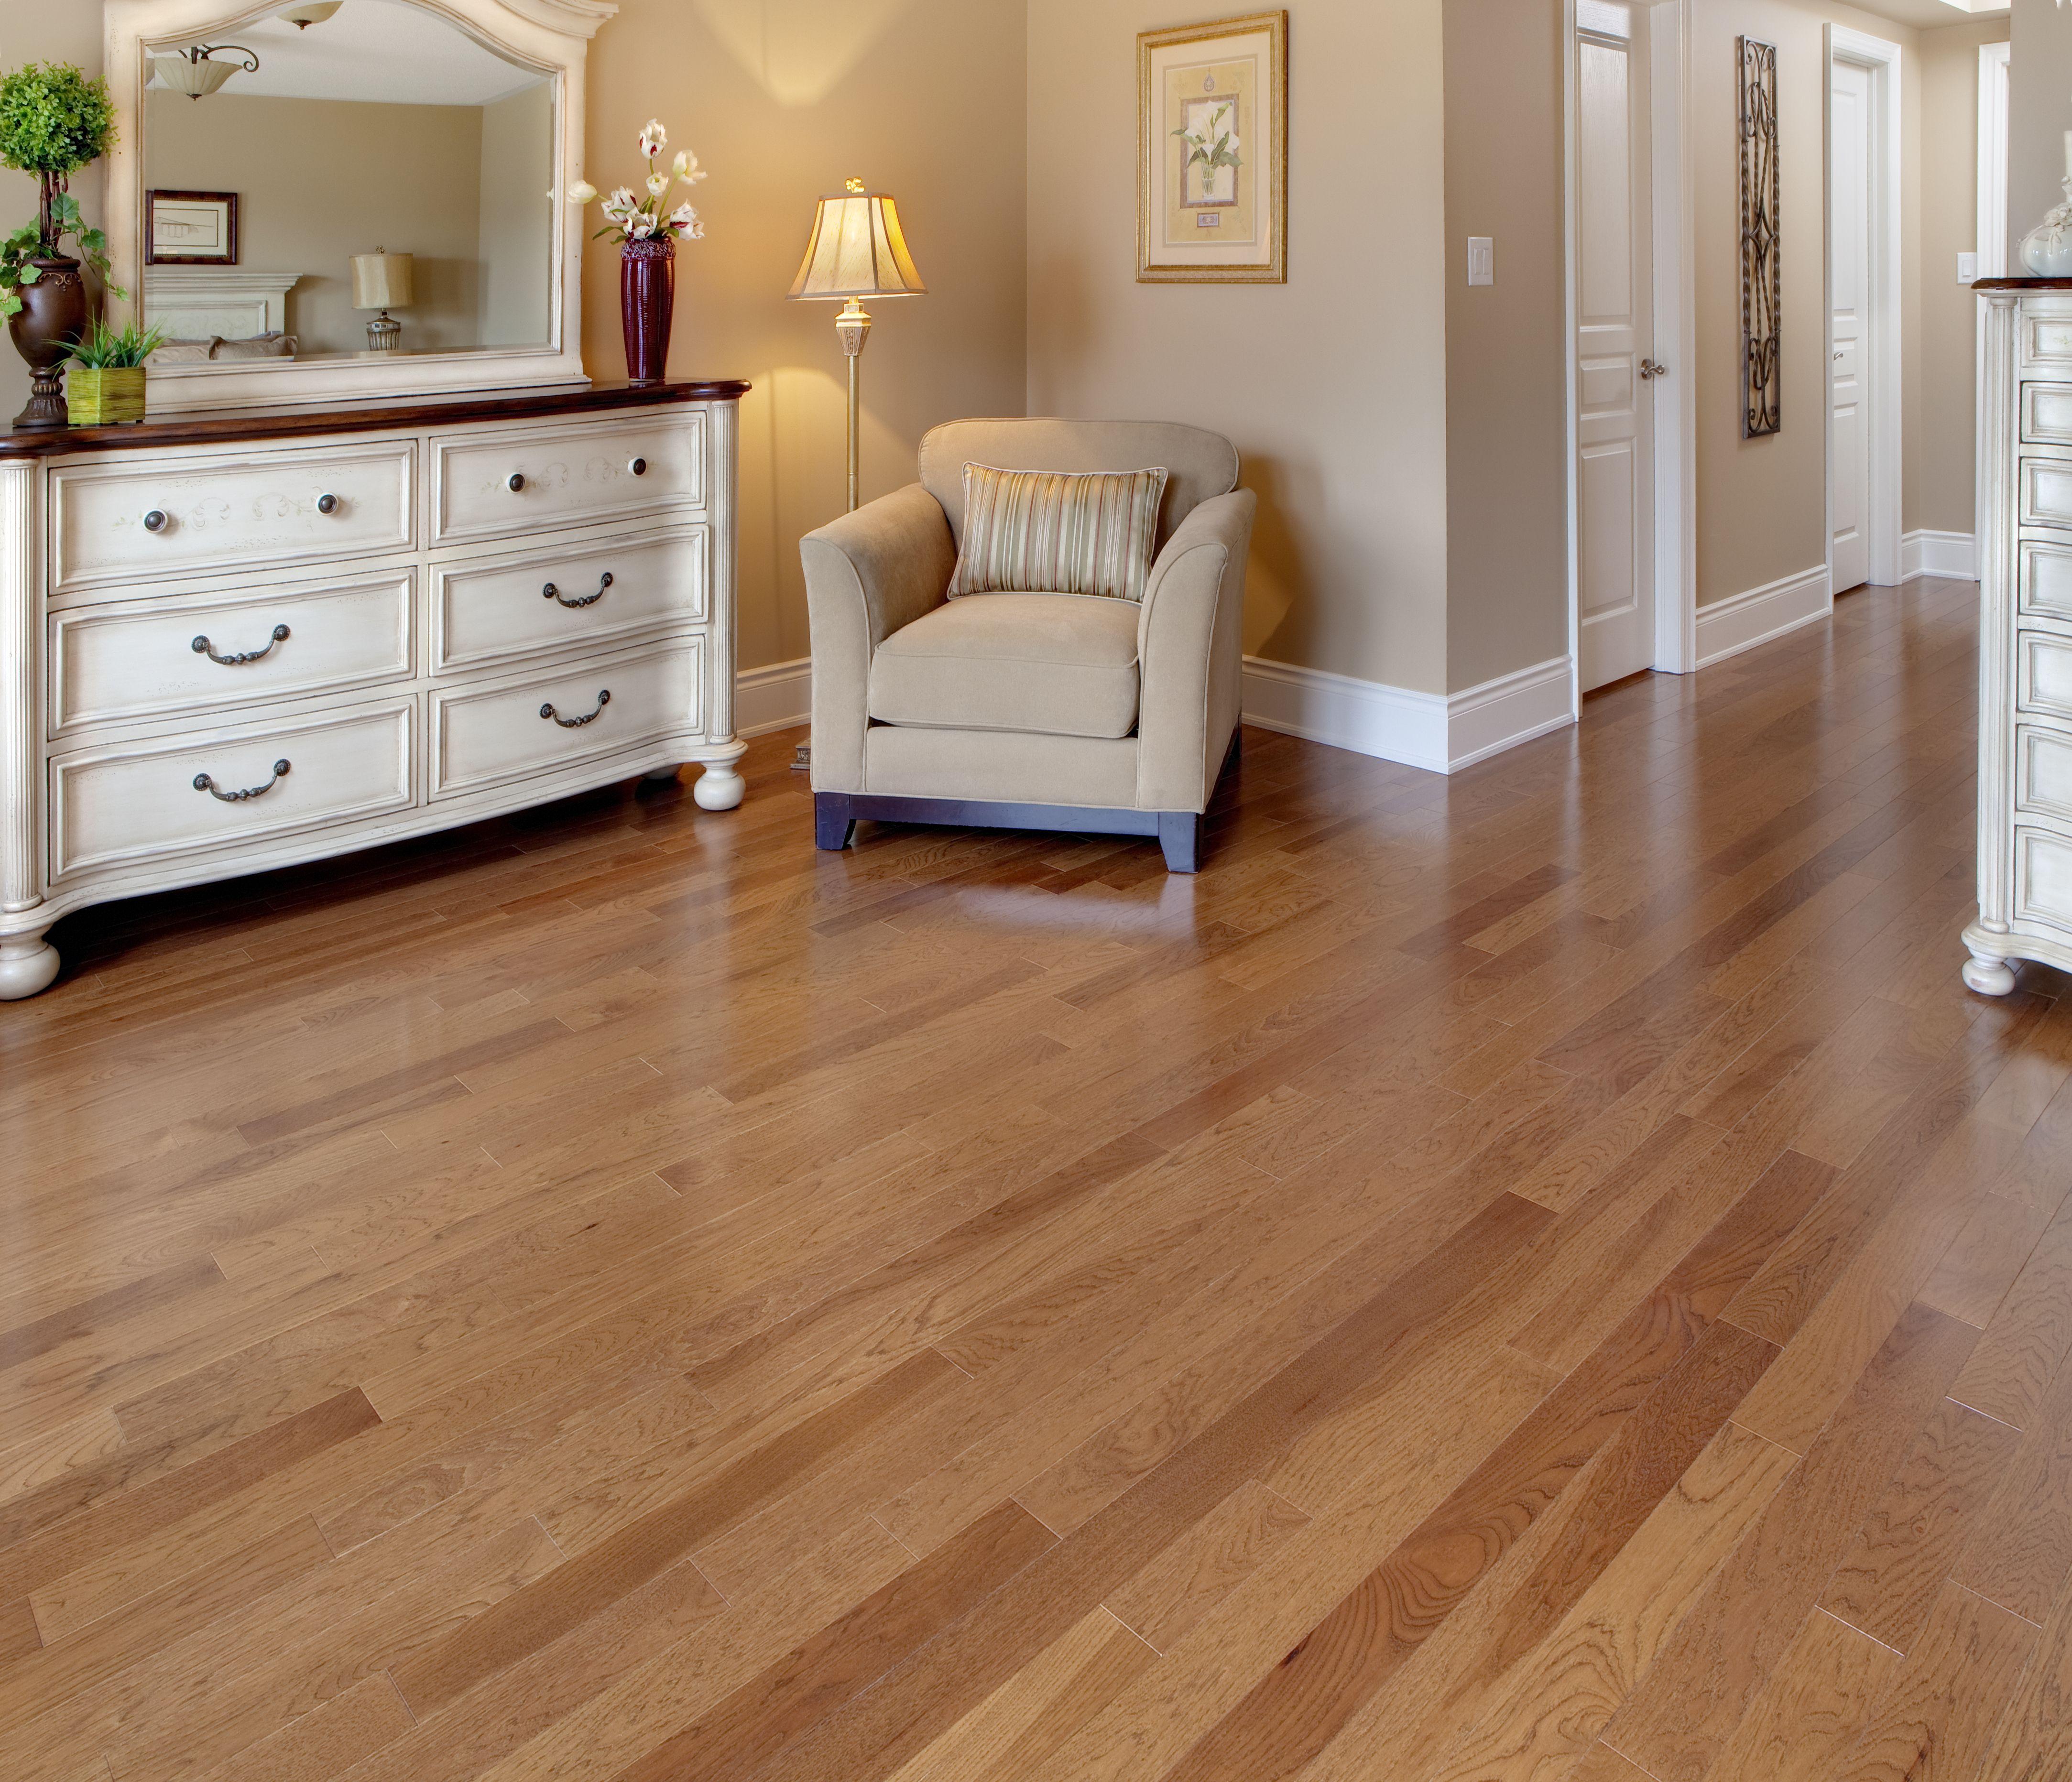 Pin by Global Carpets and Hardwood Lt on Hardwood Floor